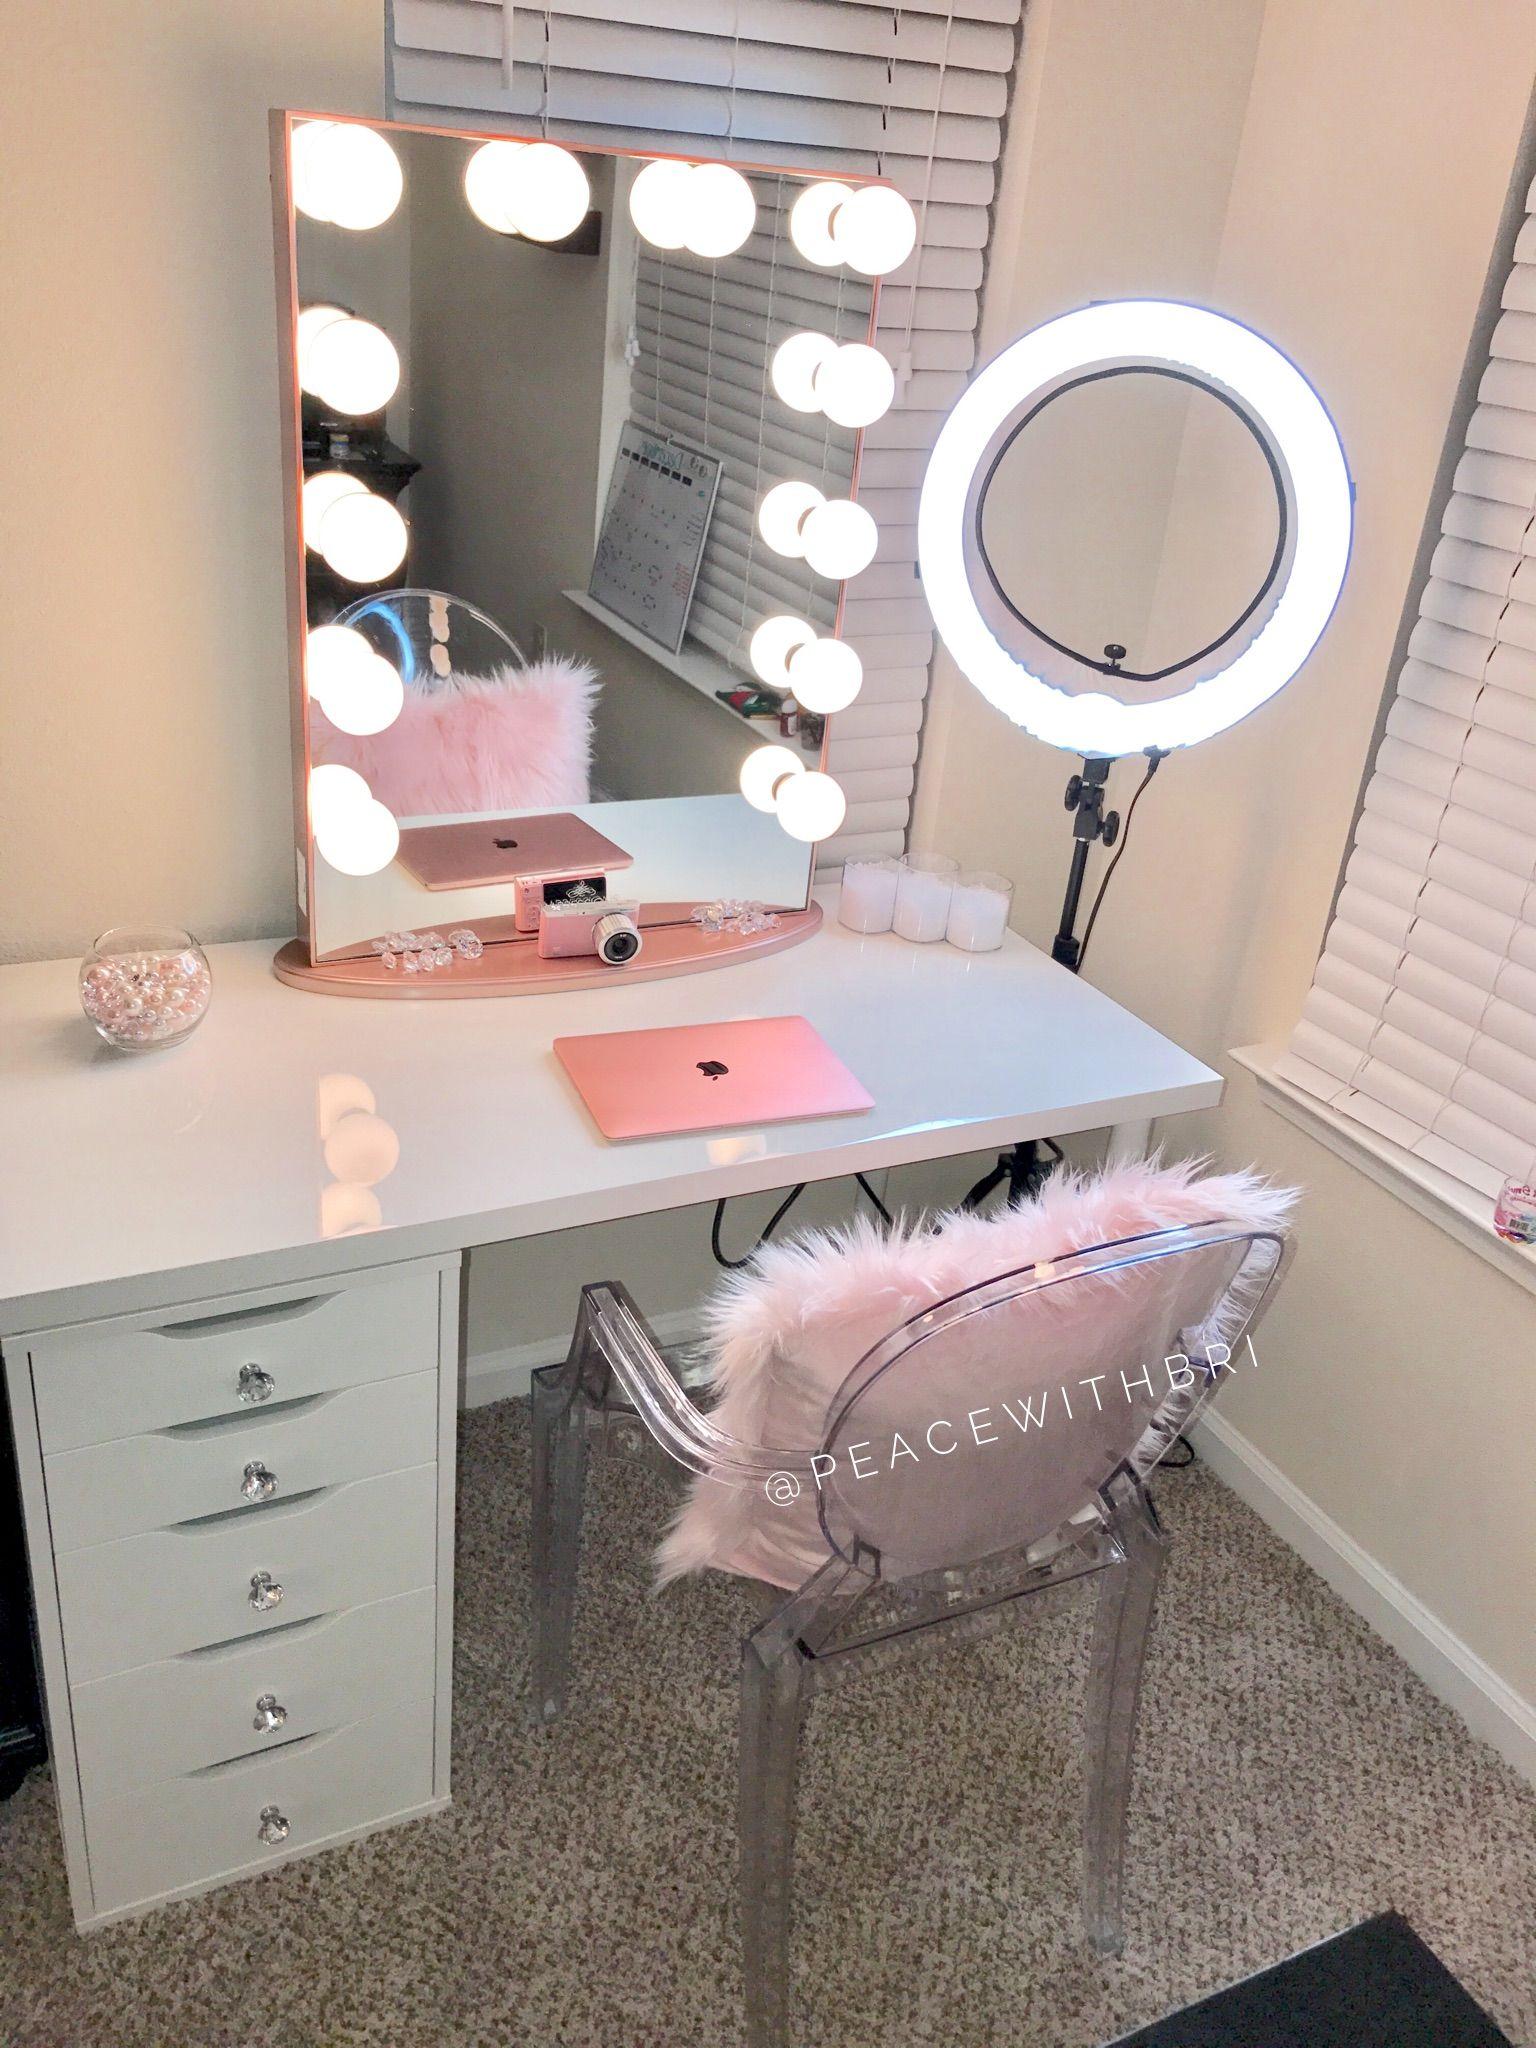 My Impression's Vanity set up. Apartment decorating